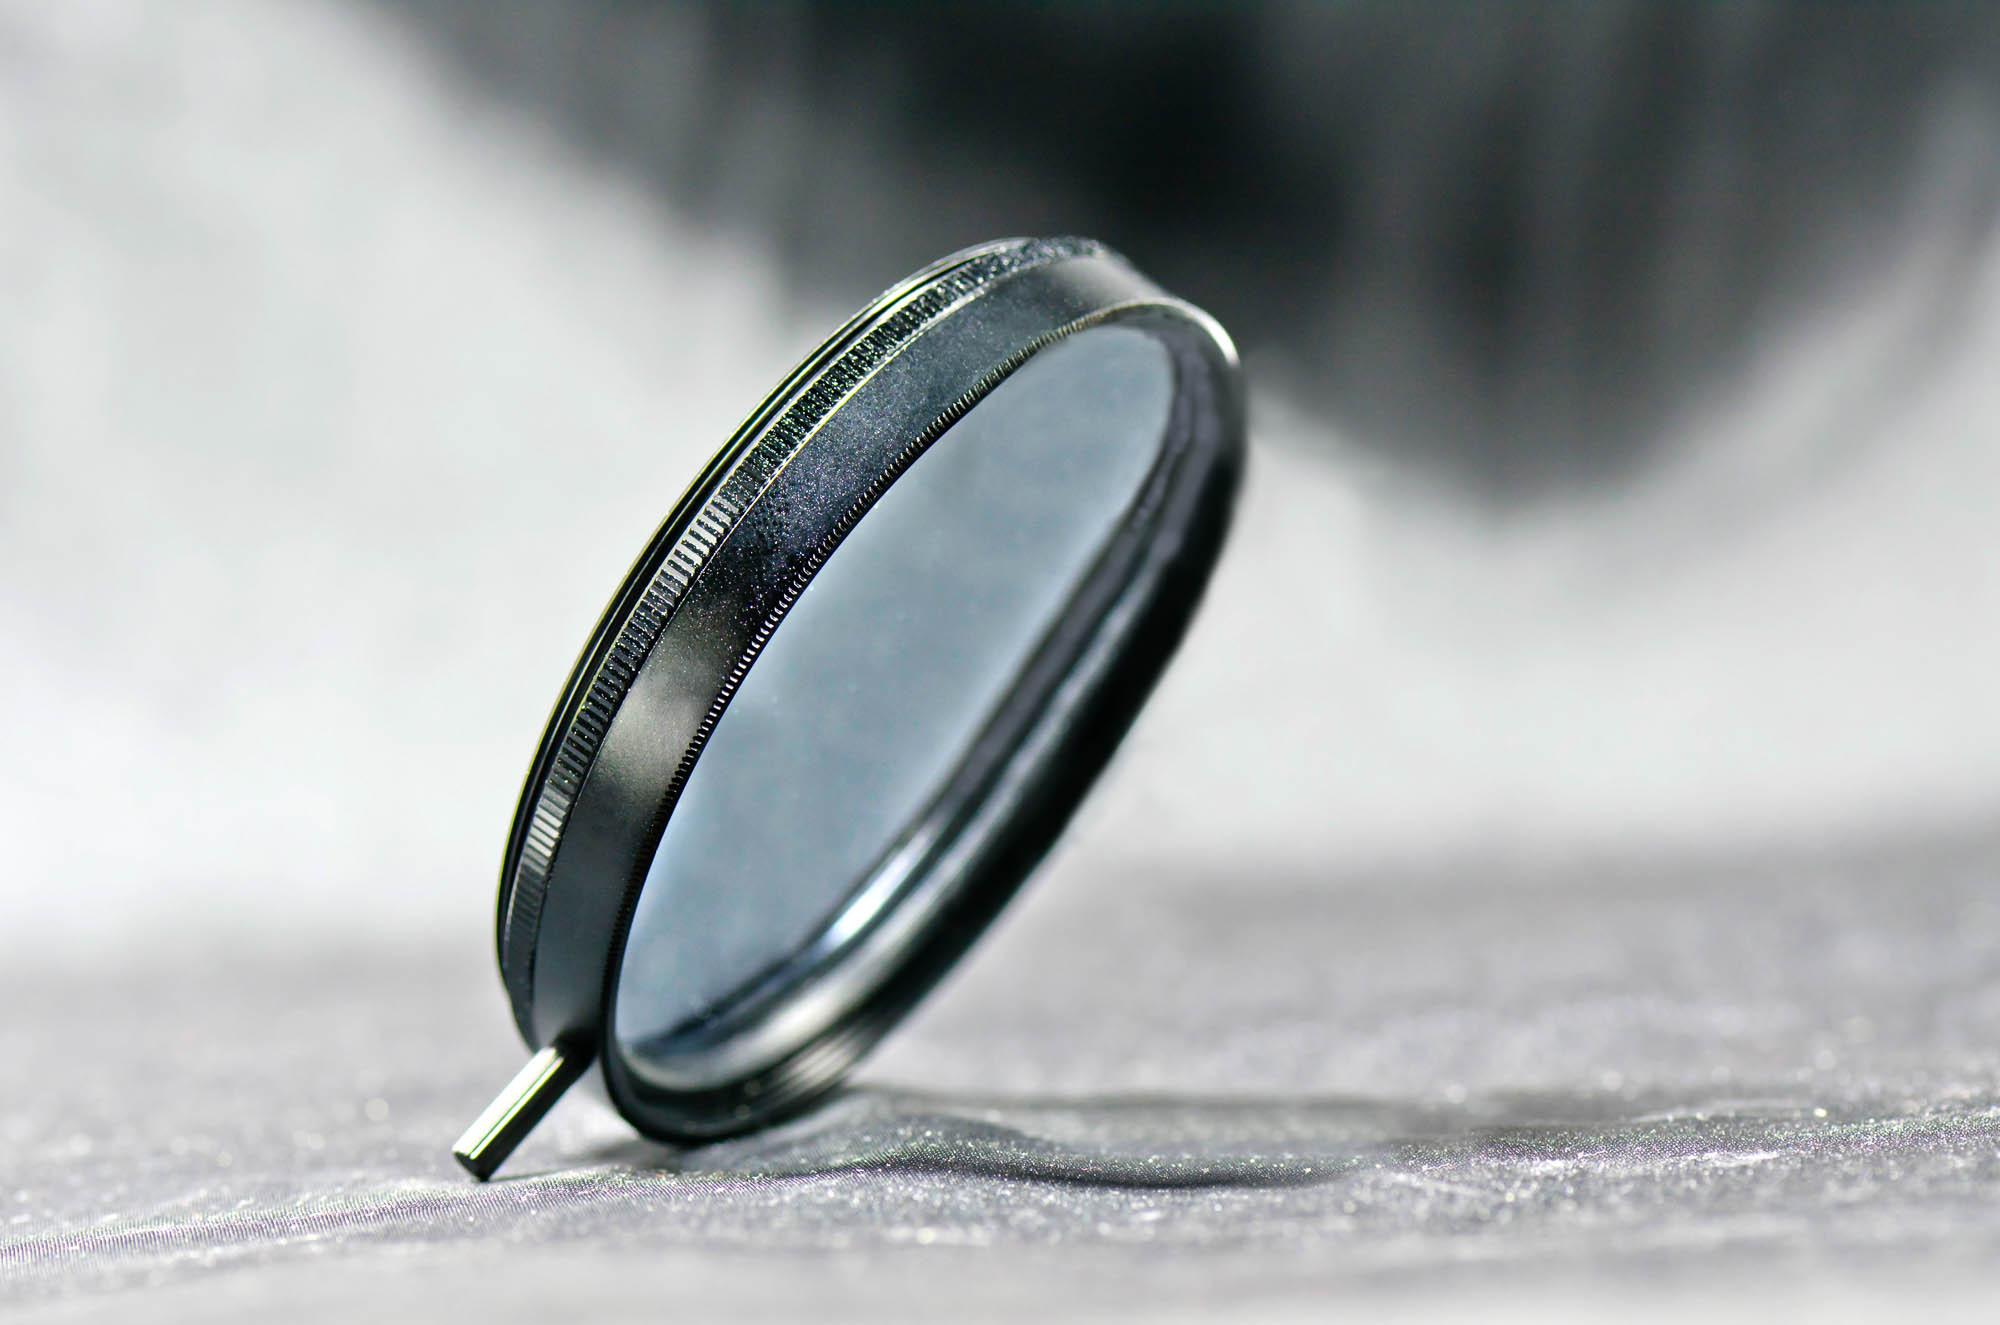 Screw-on circular polarizing filter